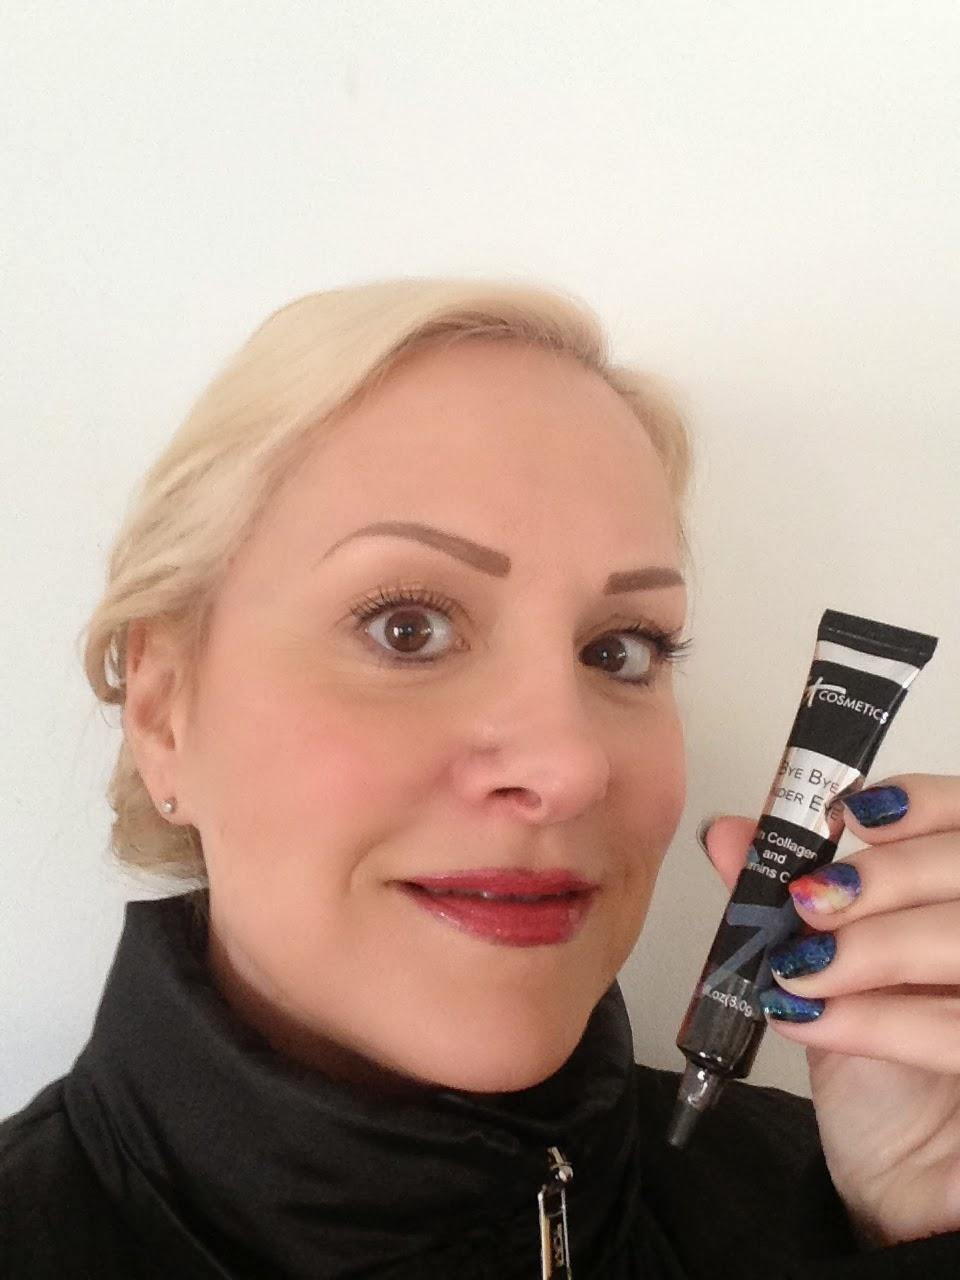 It cosmetics by jamie kern bye bye under eye full coverage